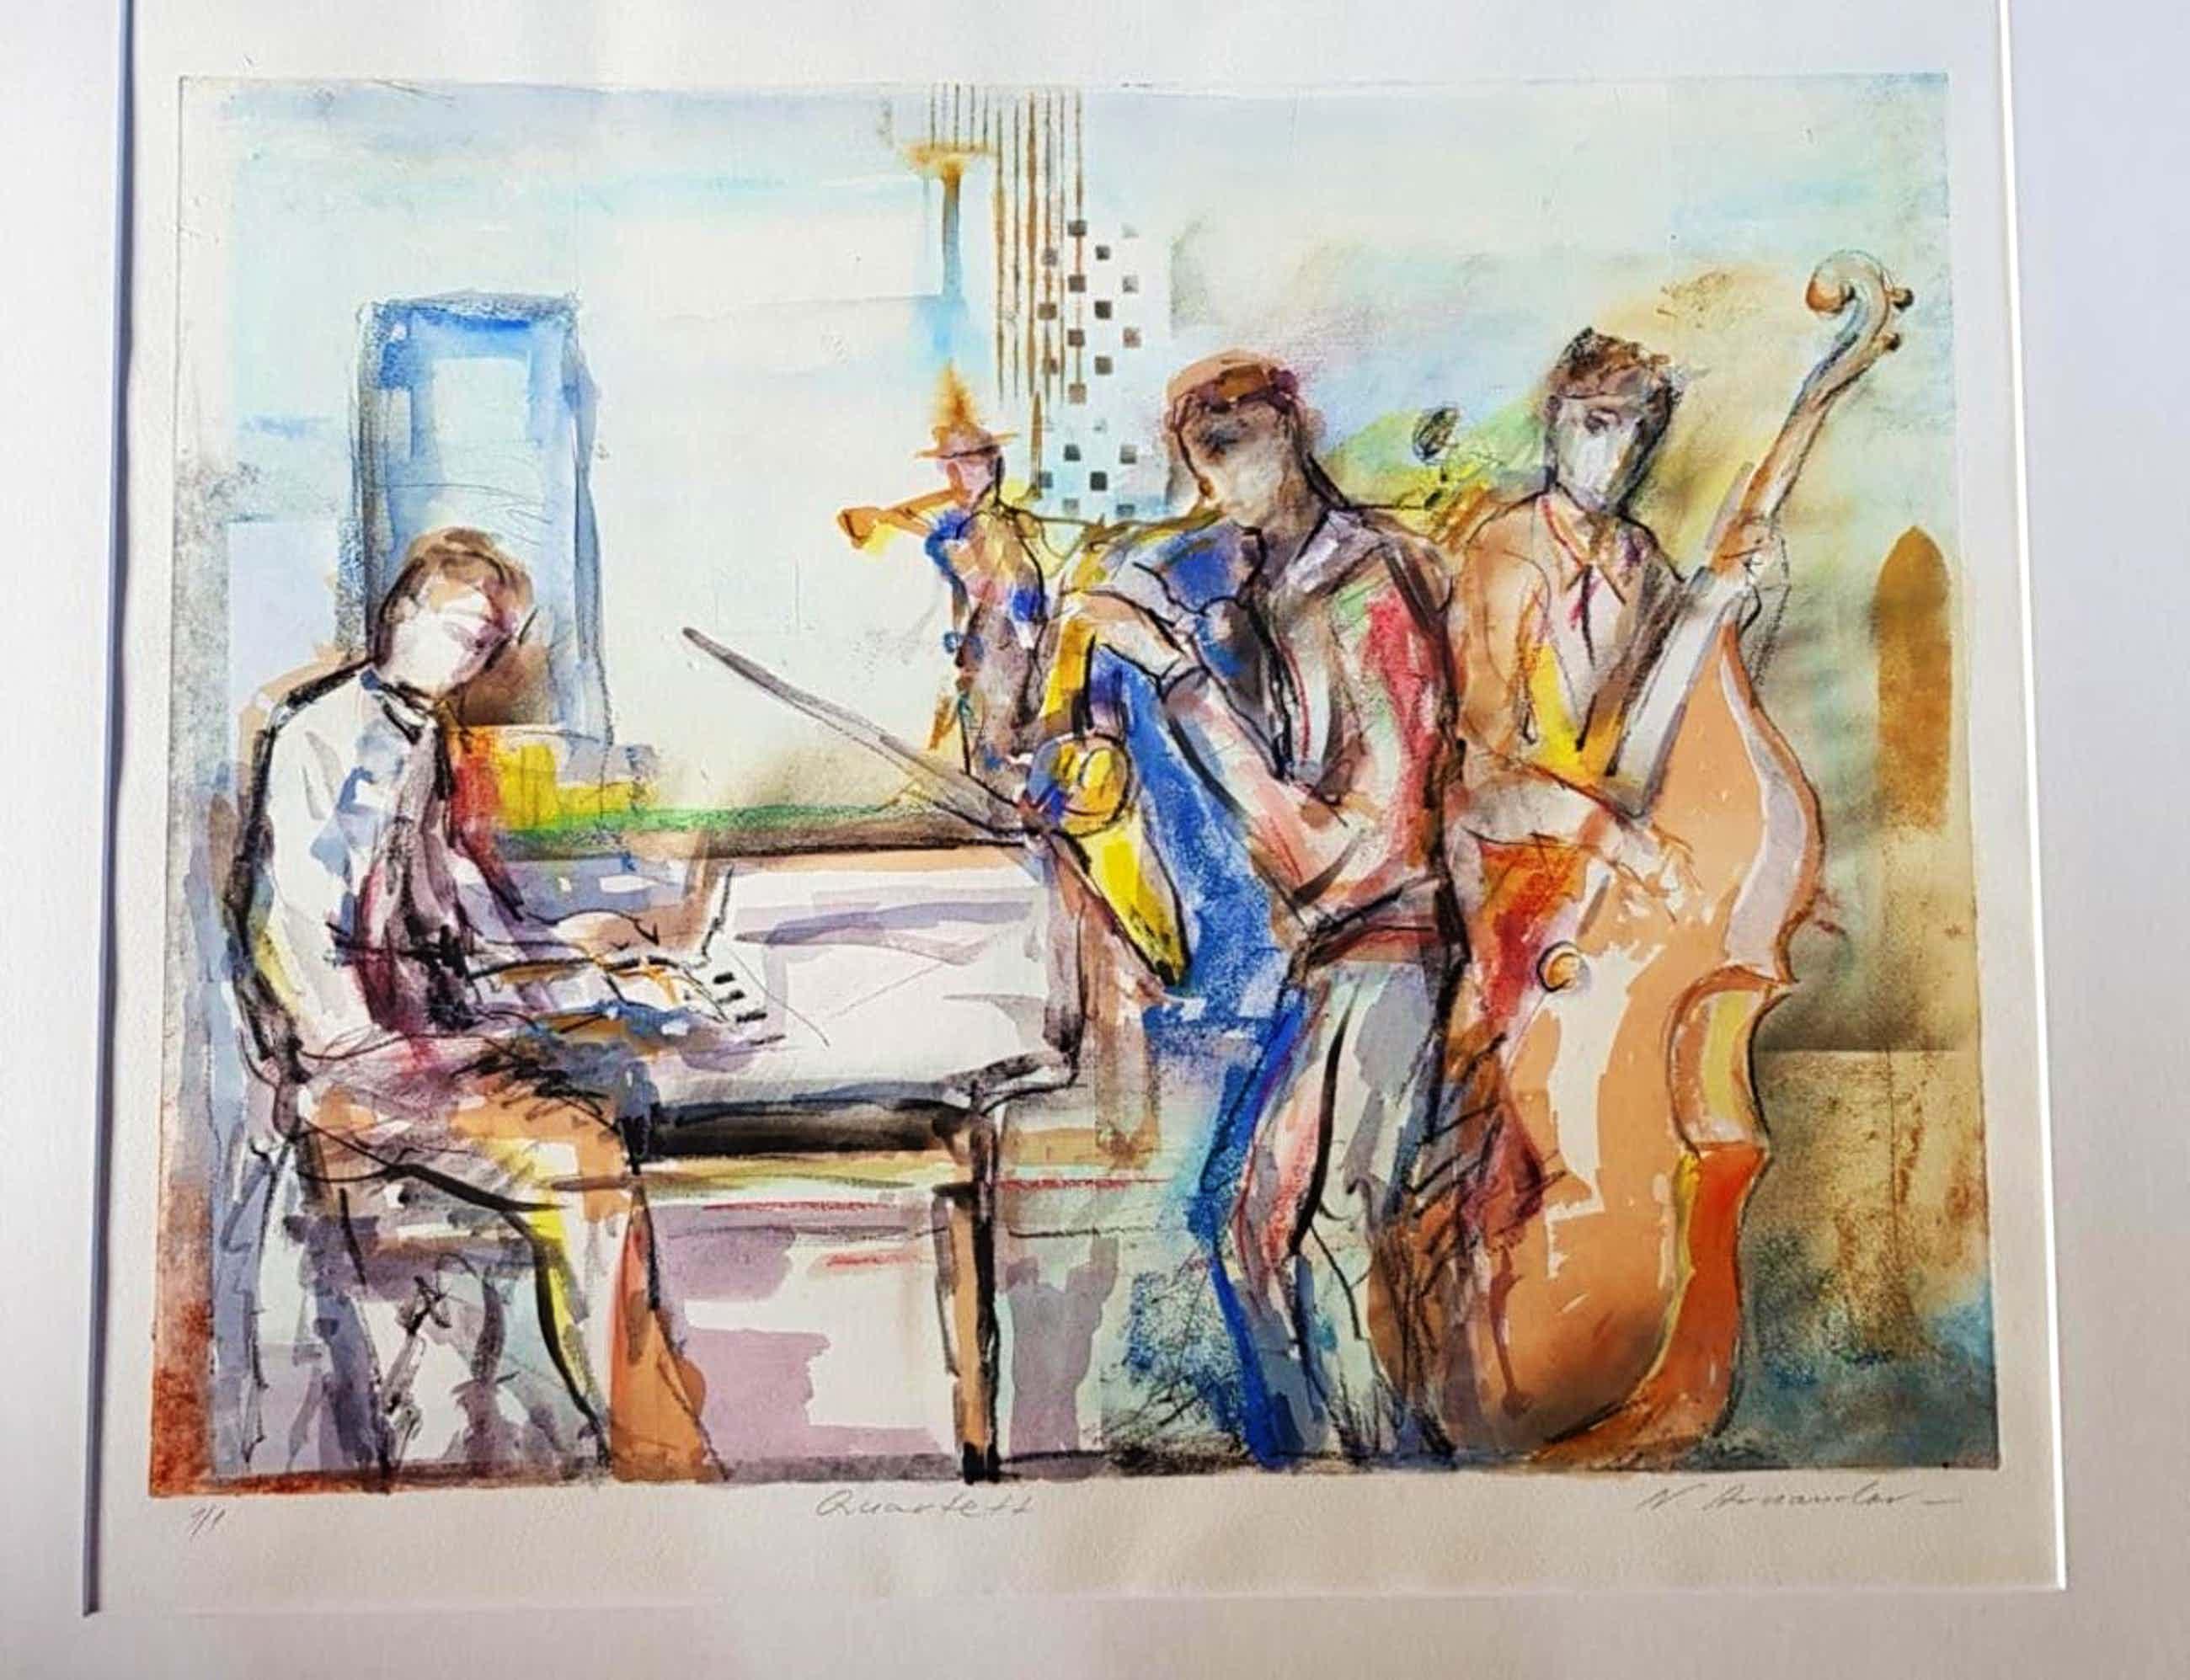 Nicolai Arnaudov - Quartett, Unikat-Radierung, handcoloriert kopen? Bied vanaf 170!